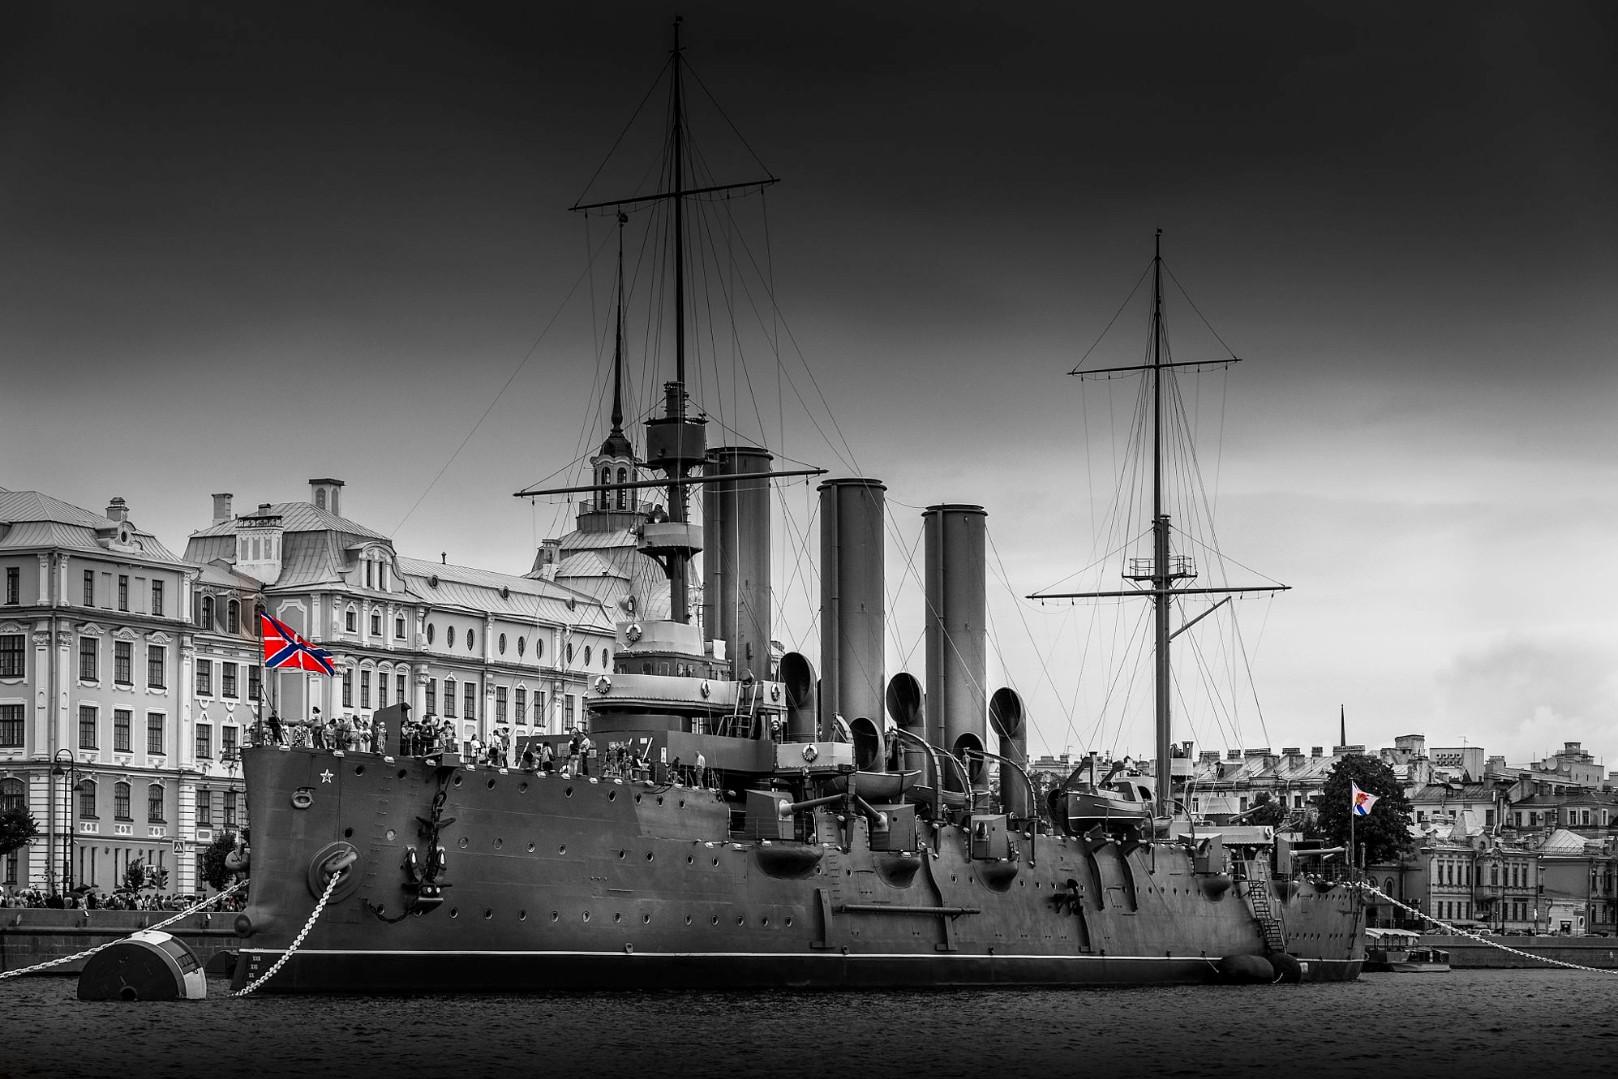 Hintergrundbilder : Schiff, Boot, einfarbig, Fahrzeug, Selektive ...